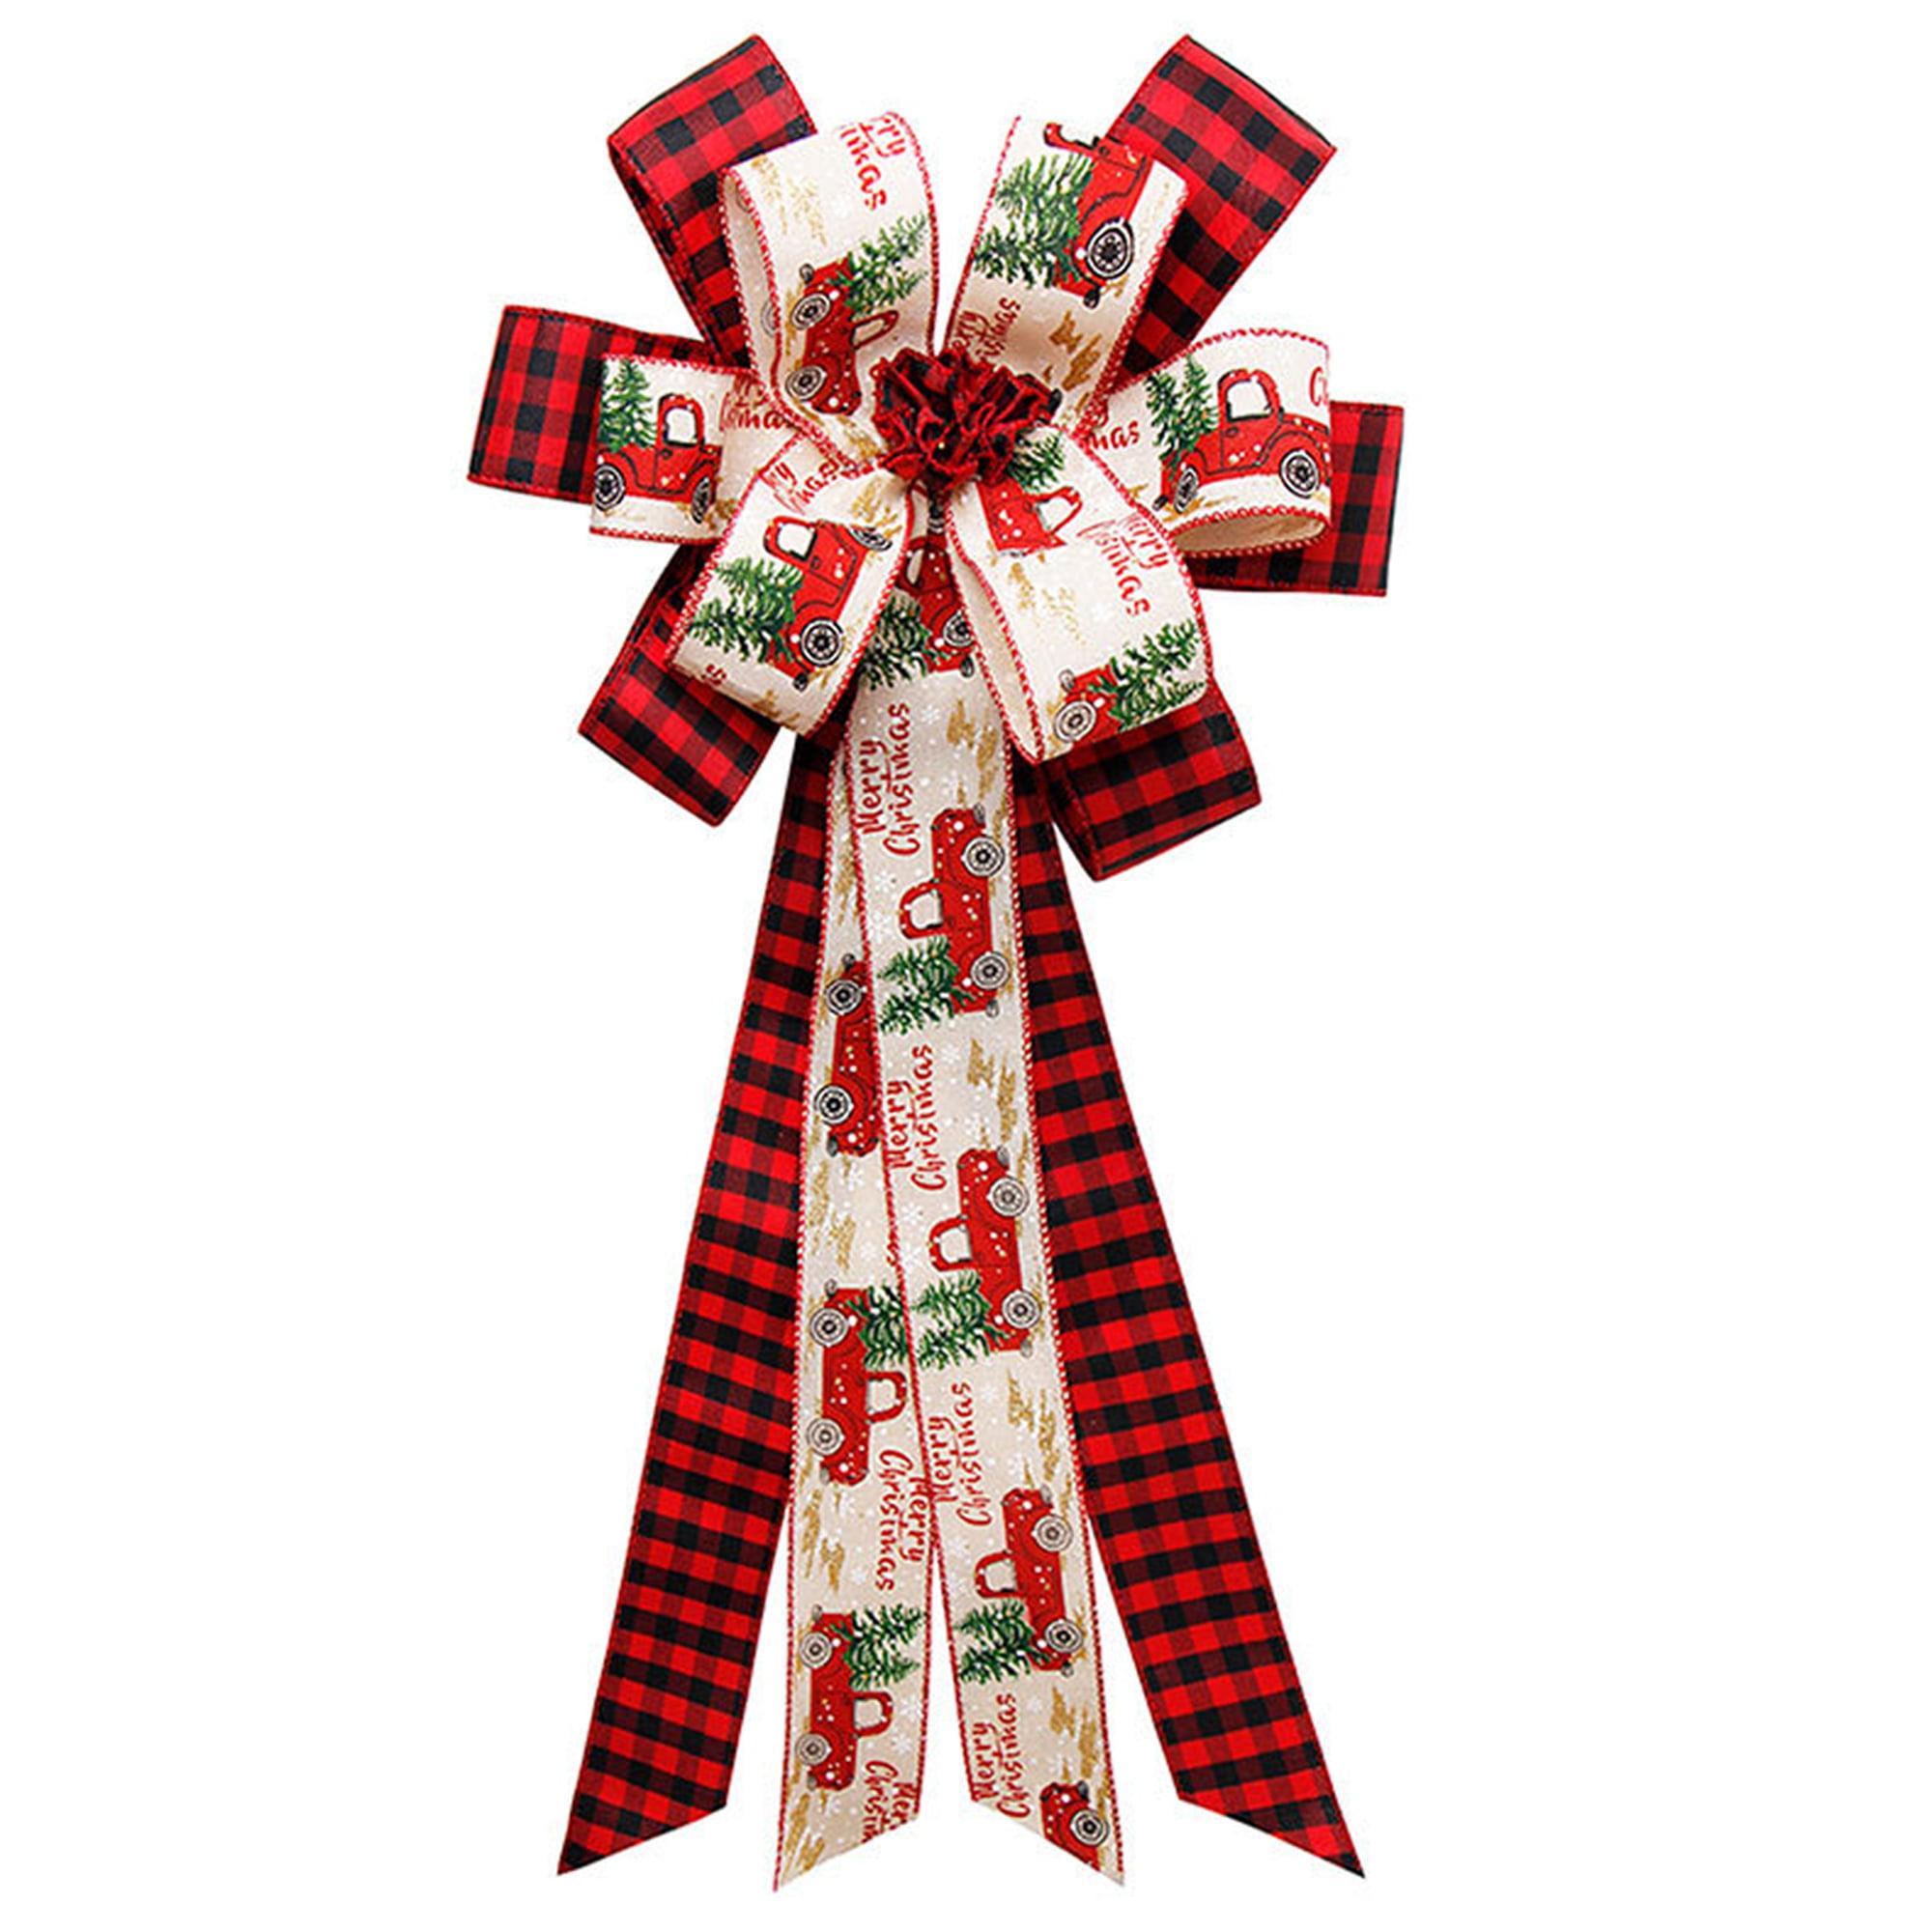 Mersariphy Christmas Tree Topper Rustic Buffalo Plaid Decorative Bow For Holiday Home Party Decor Walmart Com Walmart Com